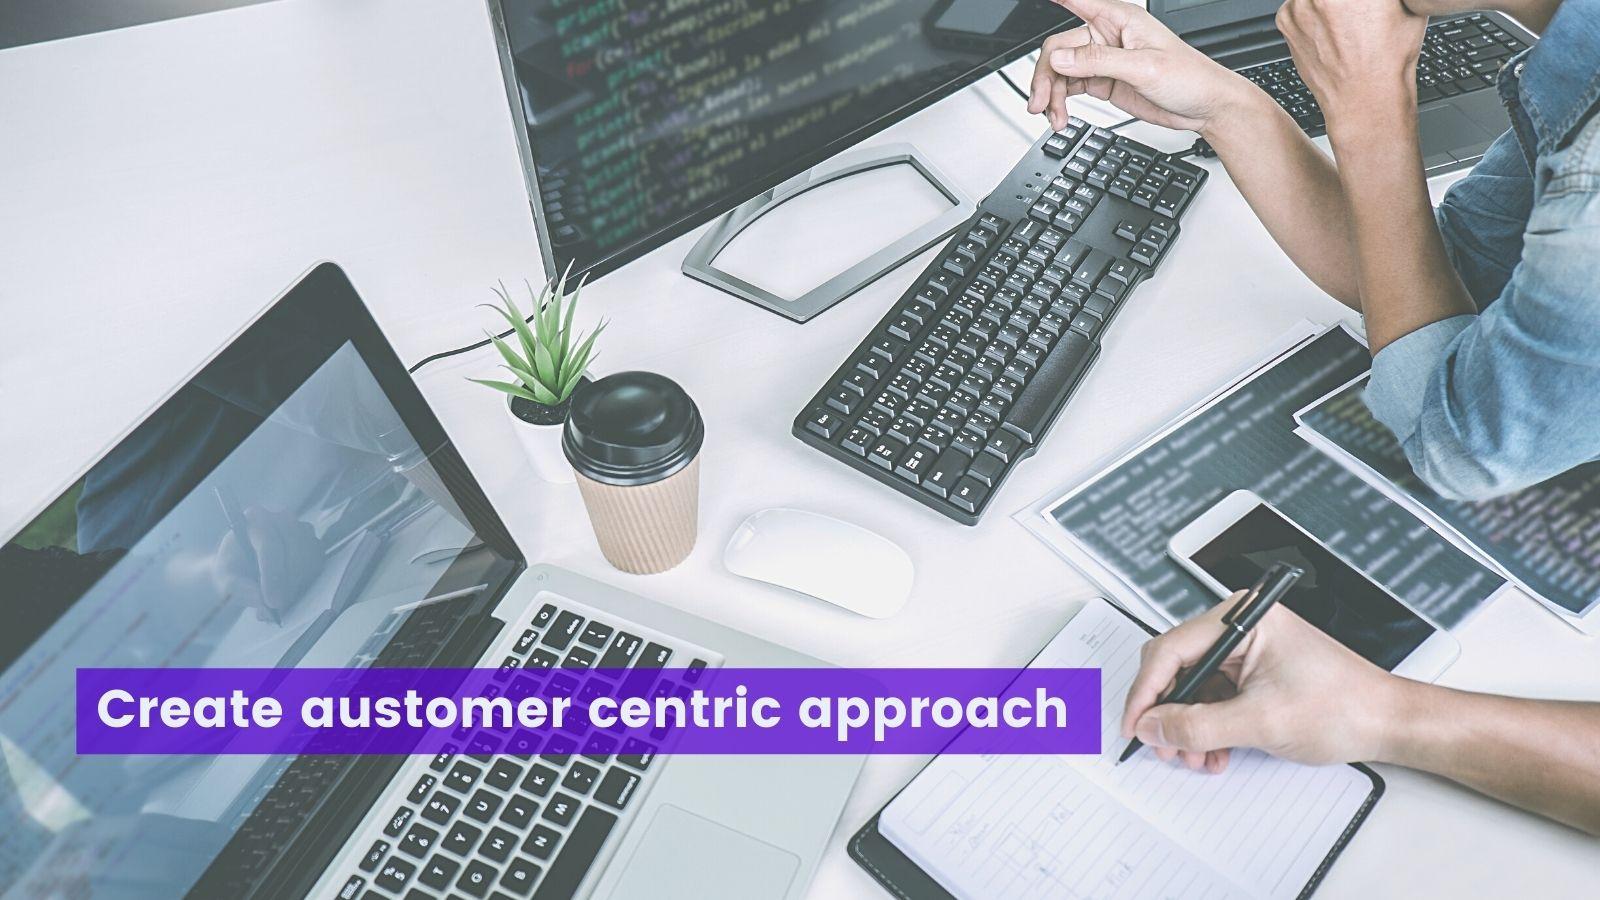 Customer centric business with Saas on agilitycms.com